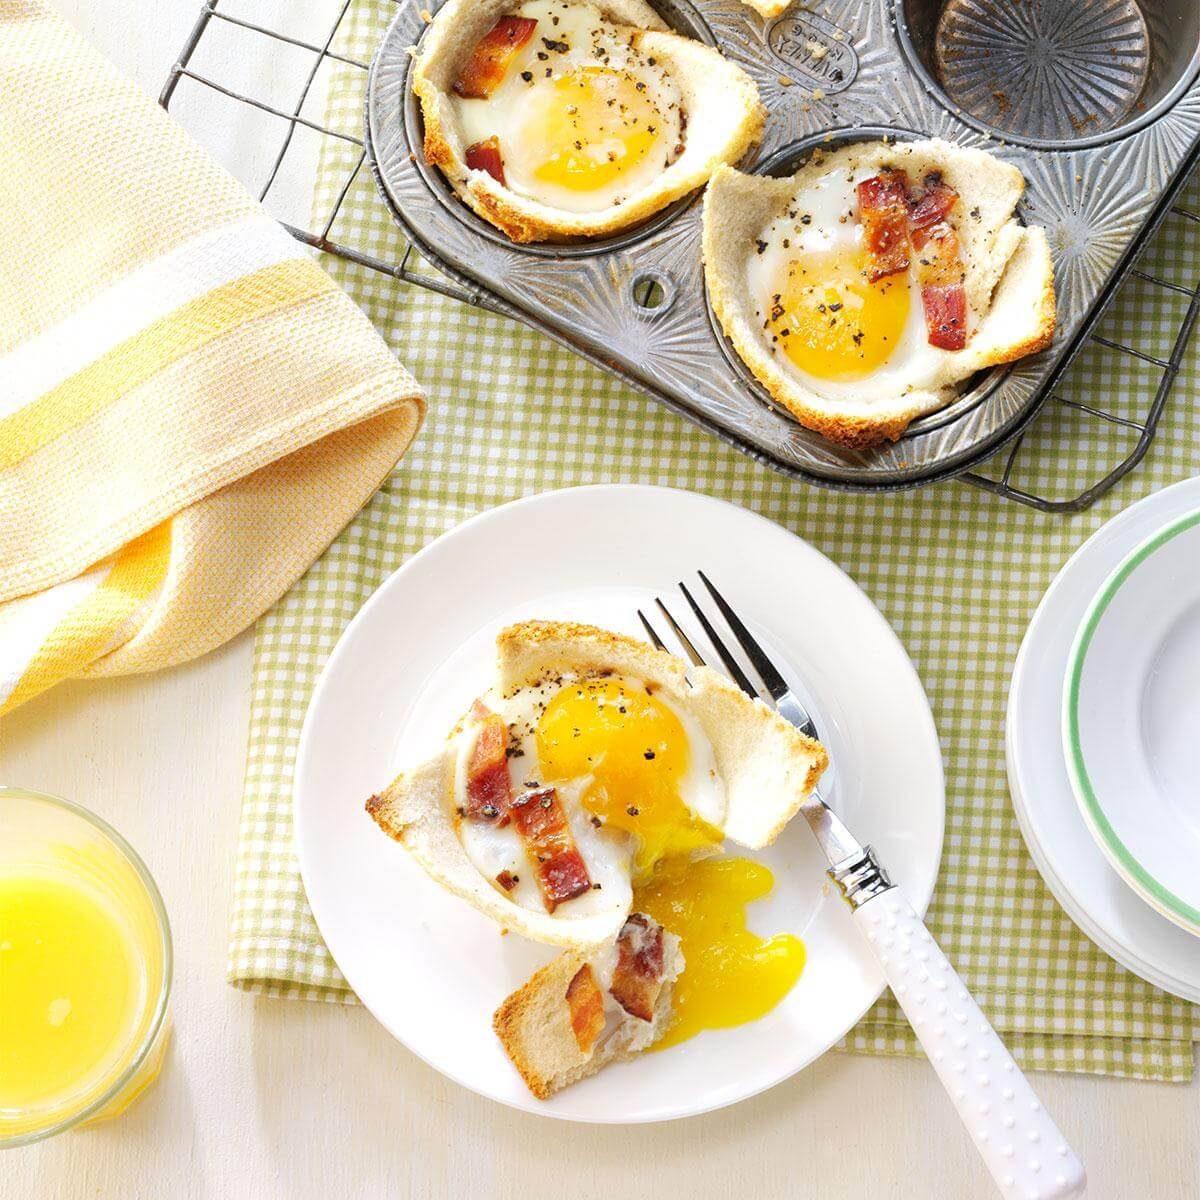 5-Ingredient Breakfast Recipes